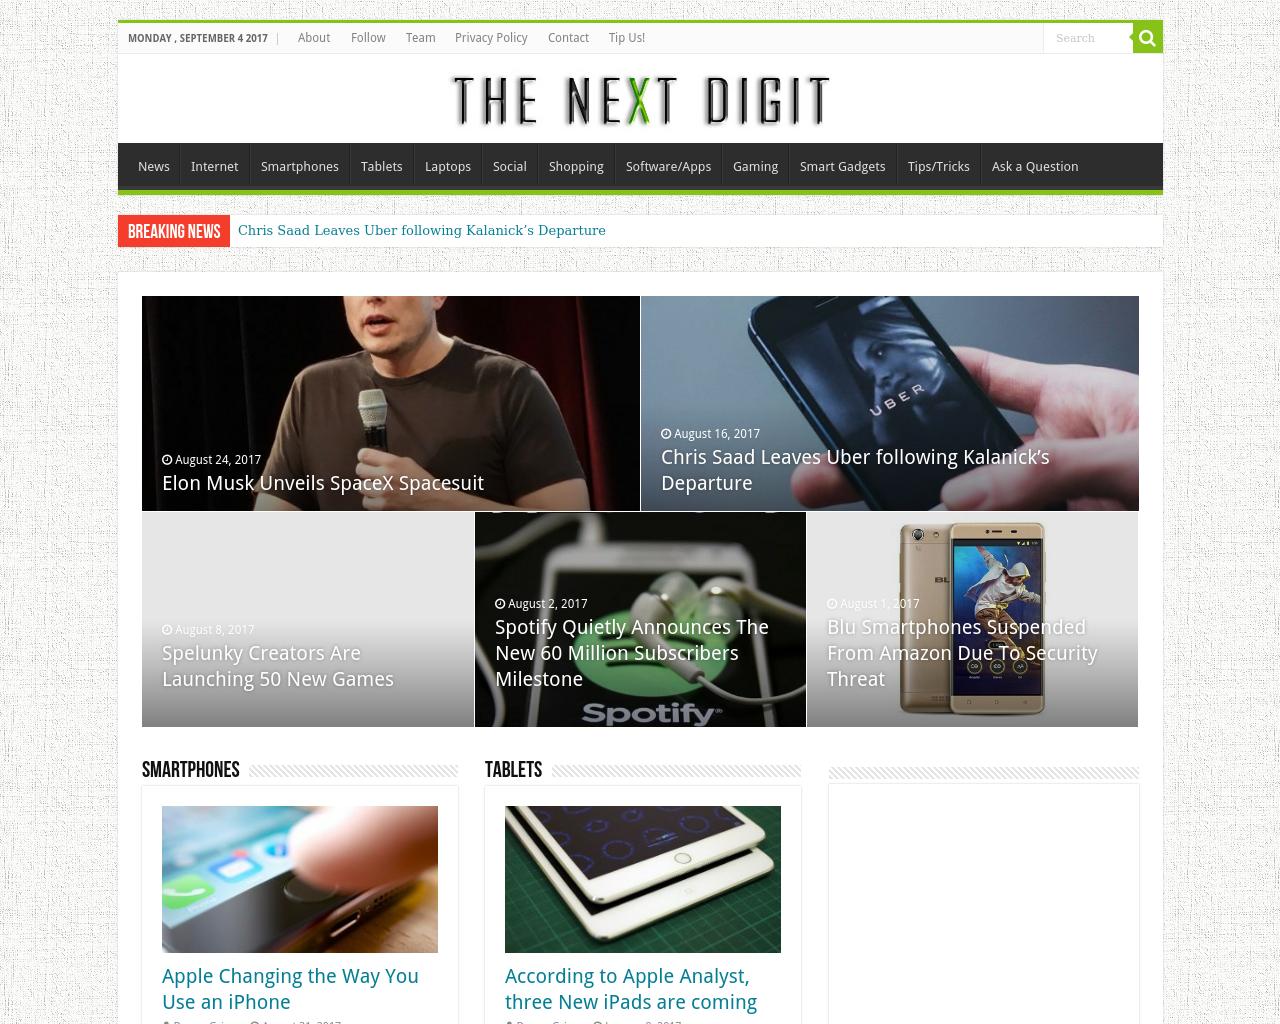 TheNextDigit-Advertising-Reviews-Pricing